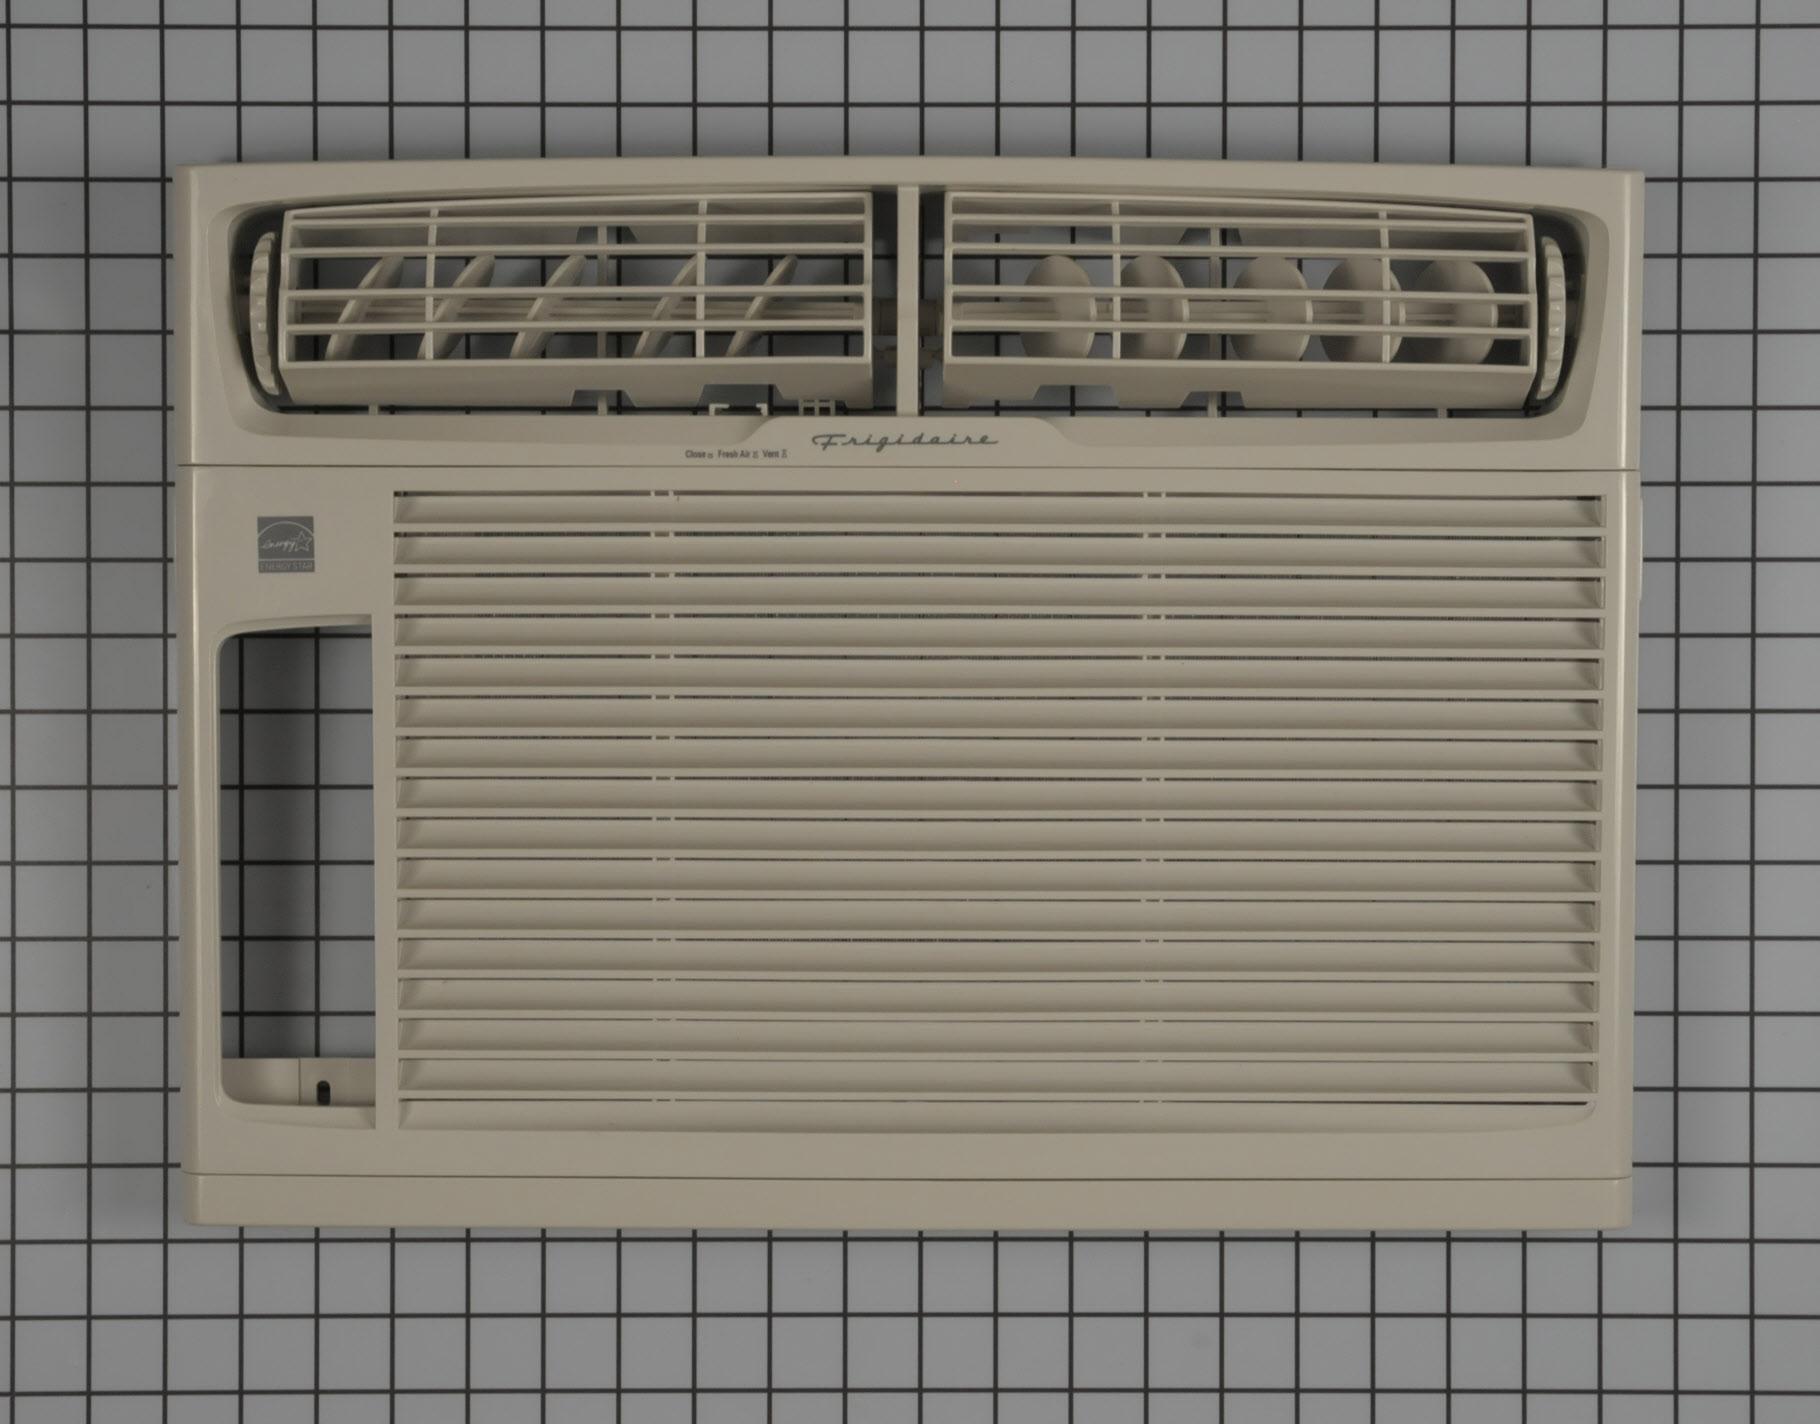 Frigidaire Air Conditioner Part # 5304467318 - Air Grille